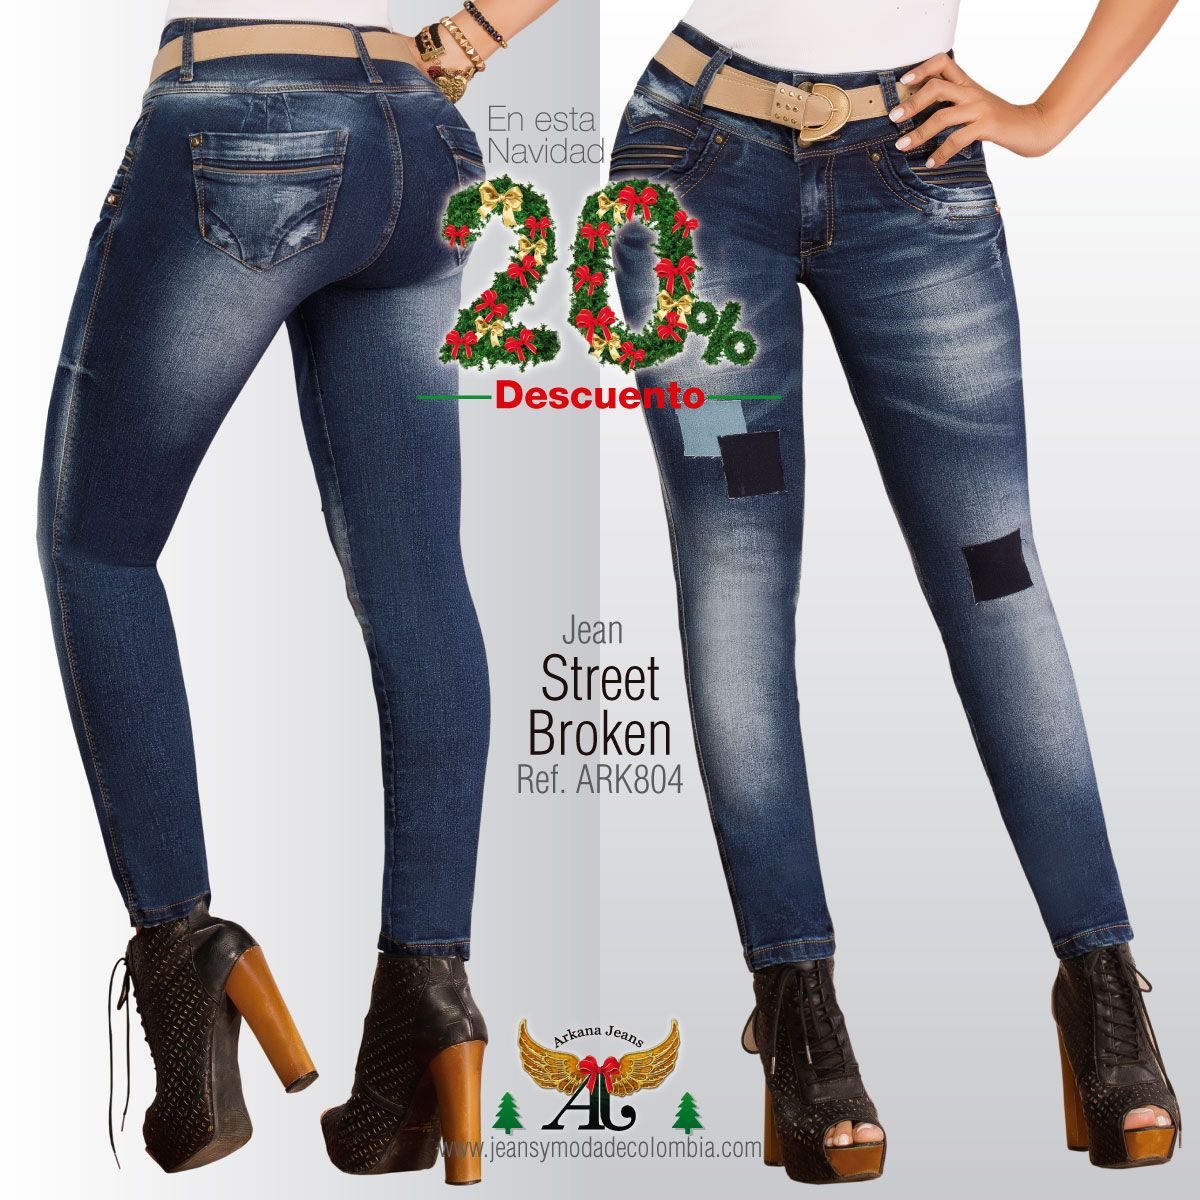 Street Broken Ref Ark 804 91 950 Antes 114 900 Jean De Tiro  # Muebles Piel De Durazno